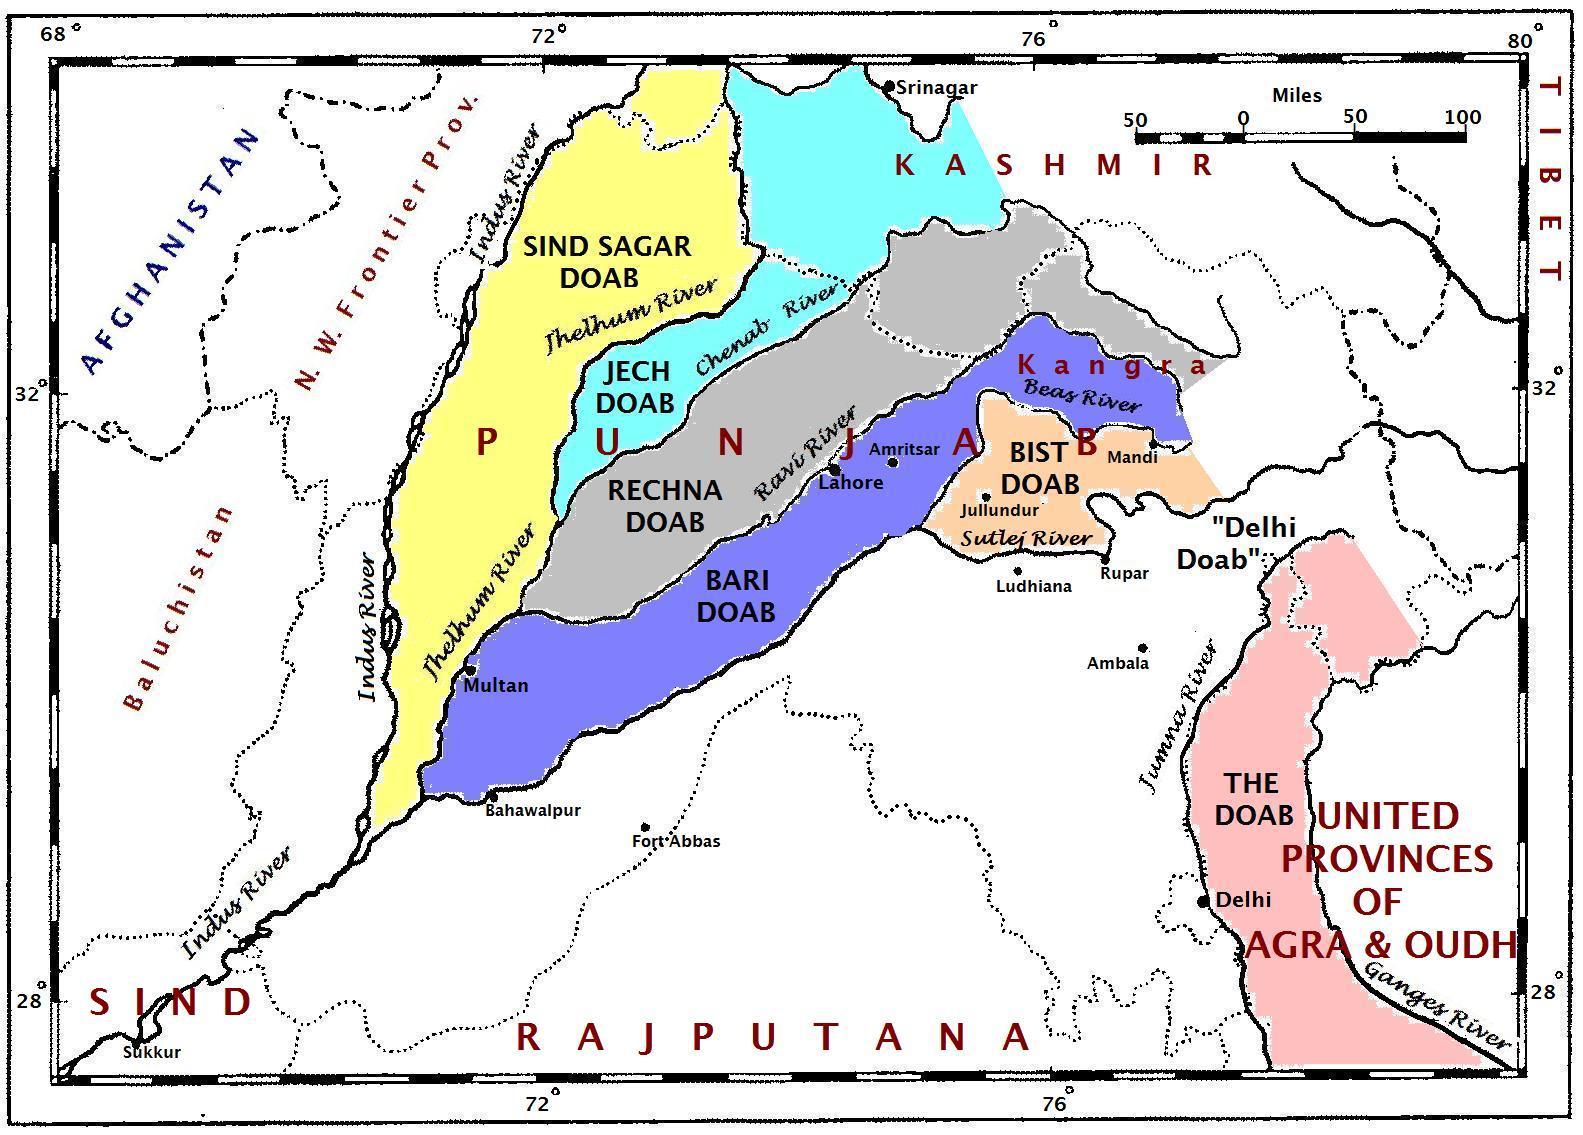 Doaba - Wikipedia